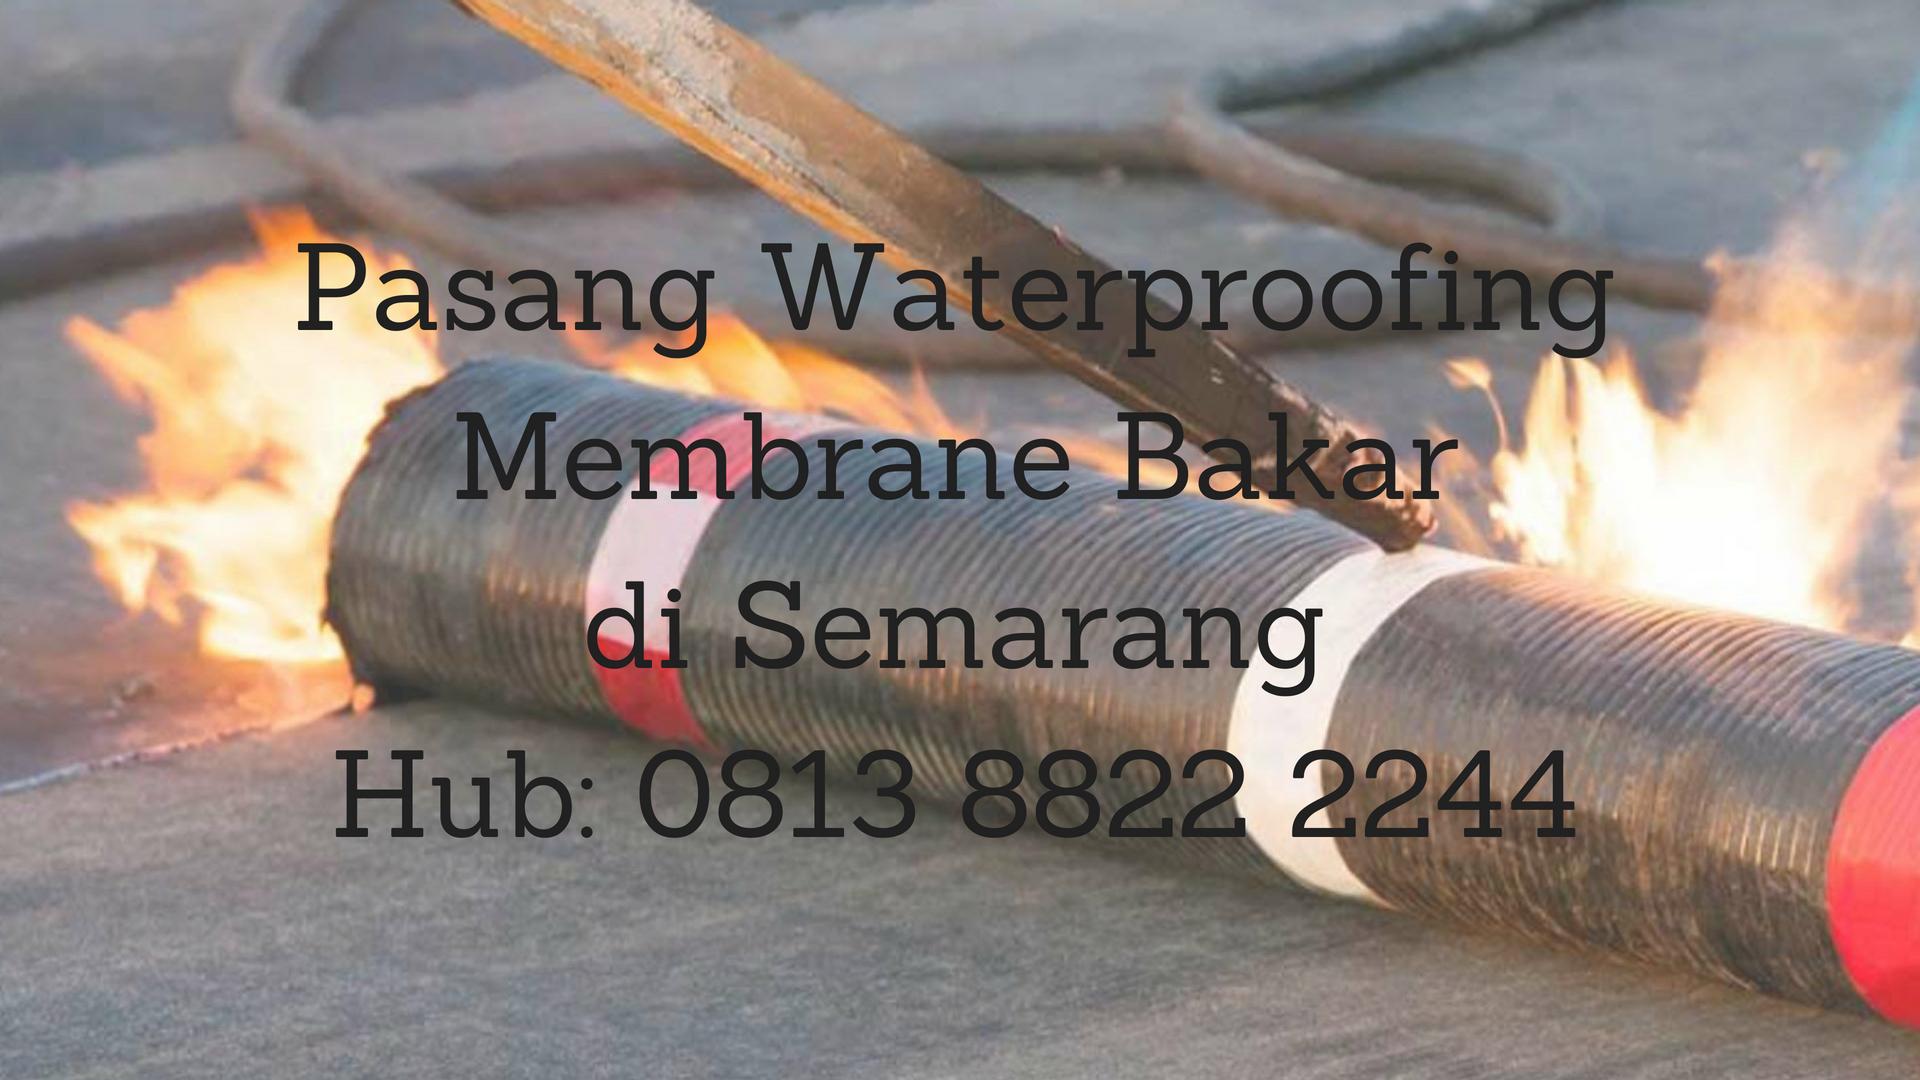 PASANG WATERPROOFING MEMBRANE BAKAR DI SEMARANG.  HUB : 0813 8822 2244